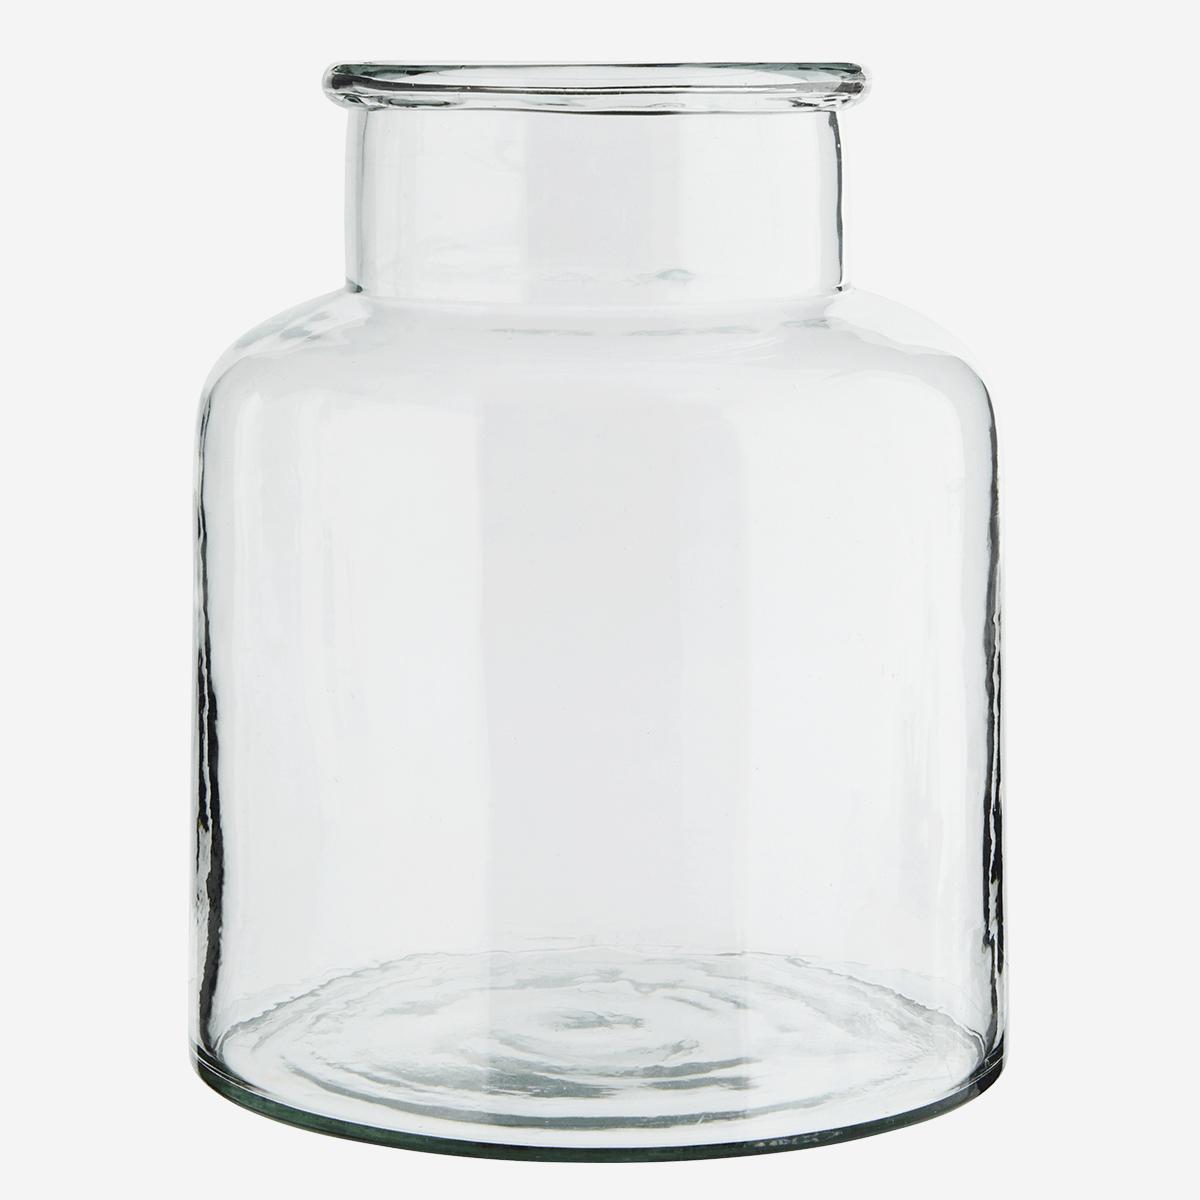 Wazon / słój szklany